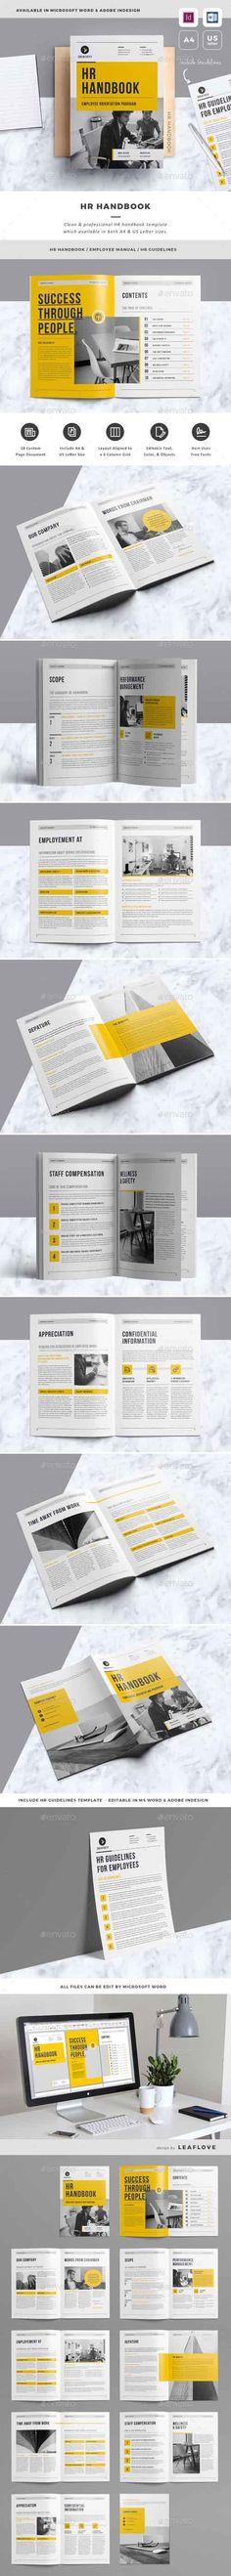 17 best Employer Brand images on Pinterest Employee handbook